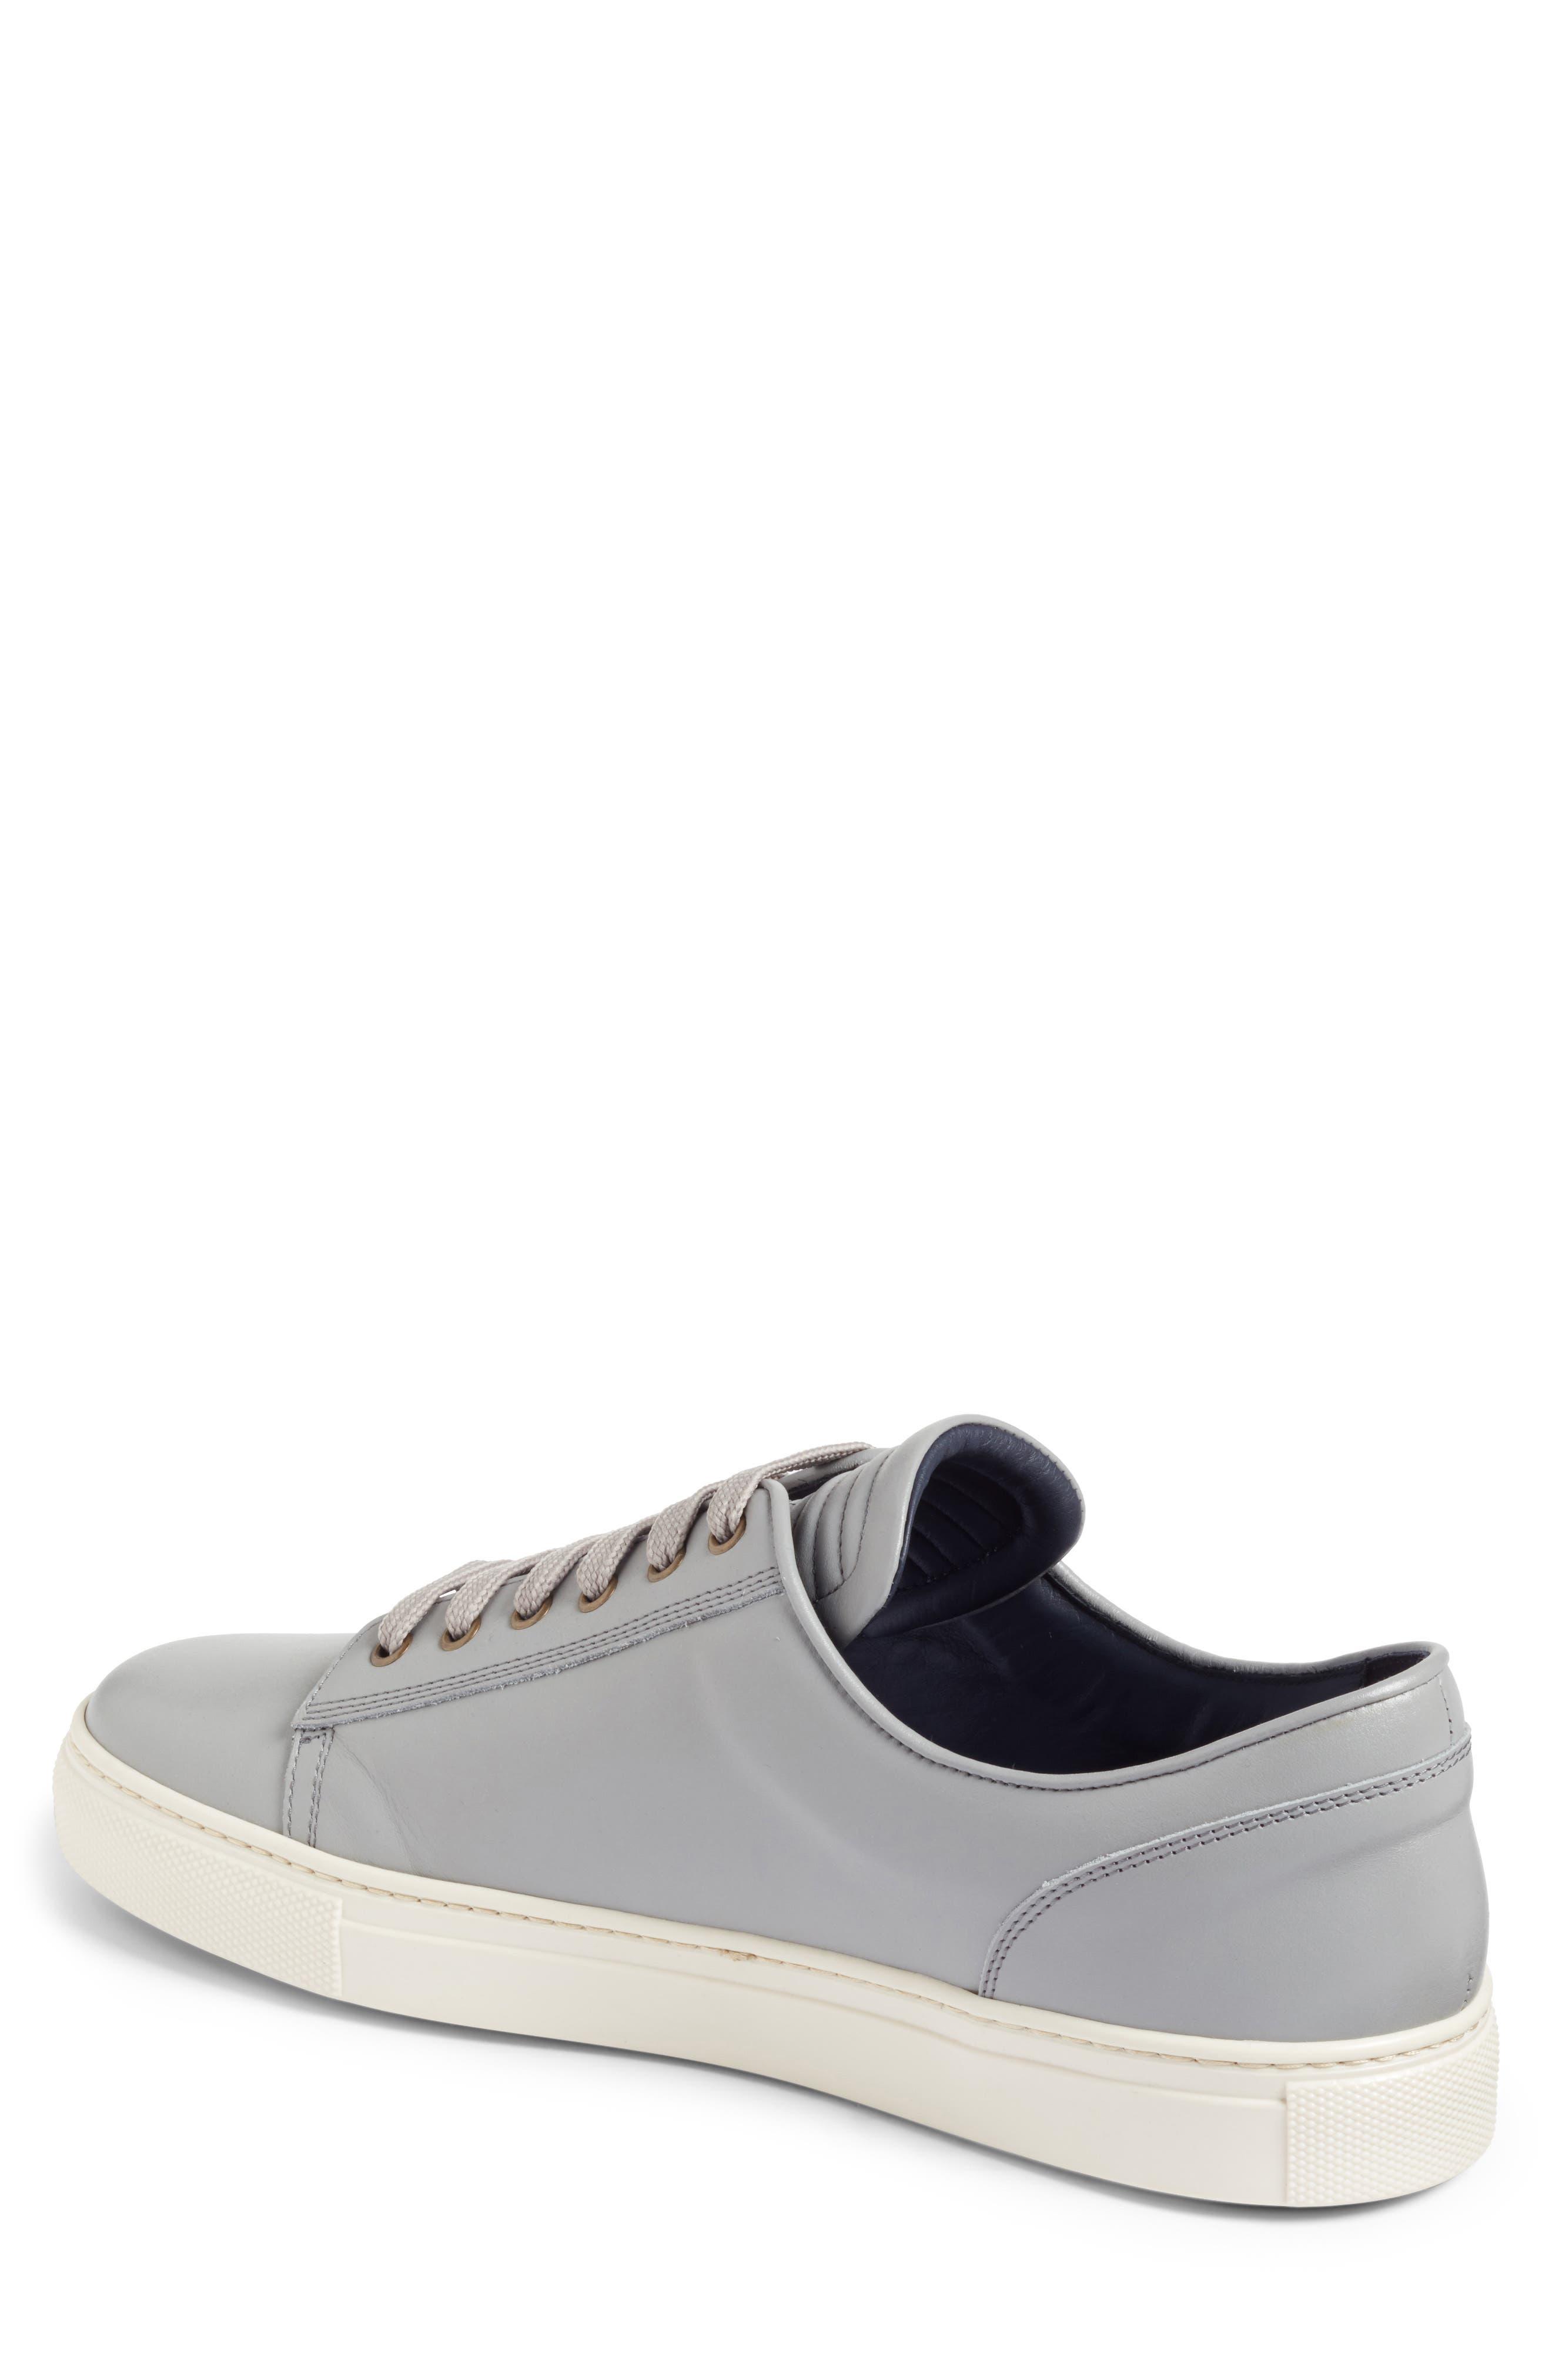 Taranto Sneaker,                             Alternate thumbnail 2, color,                             020